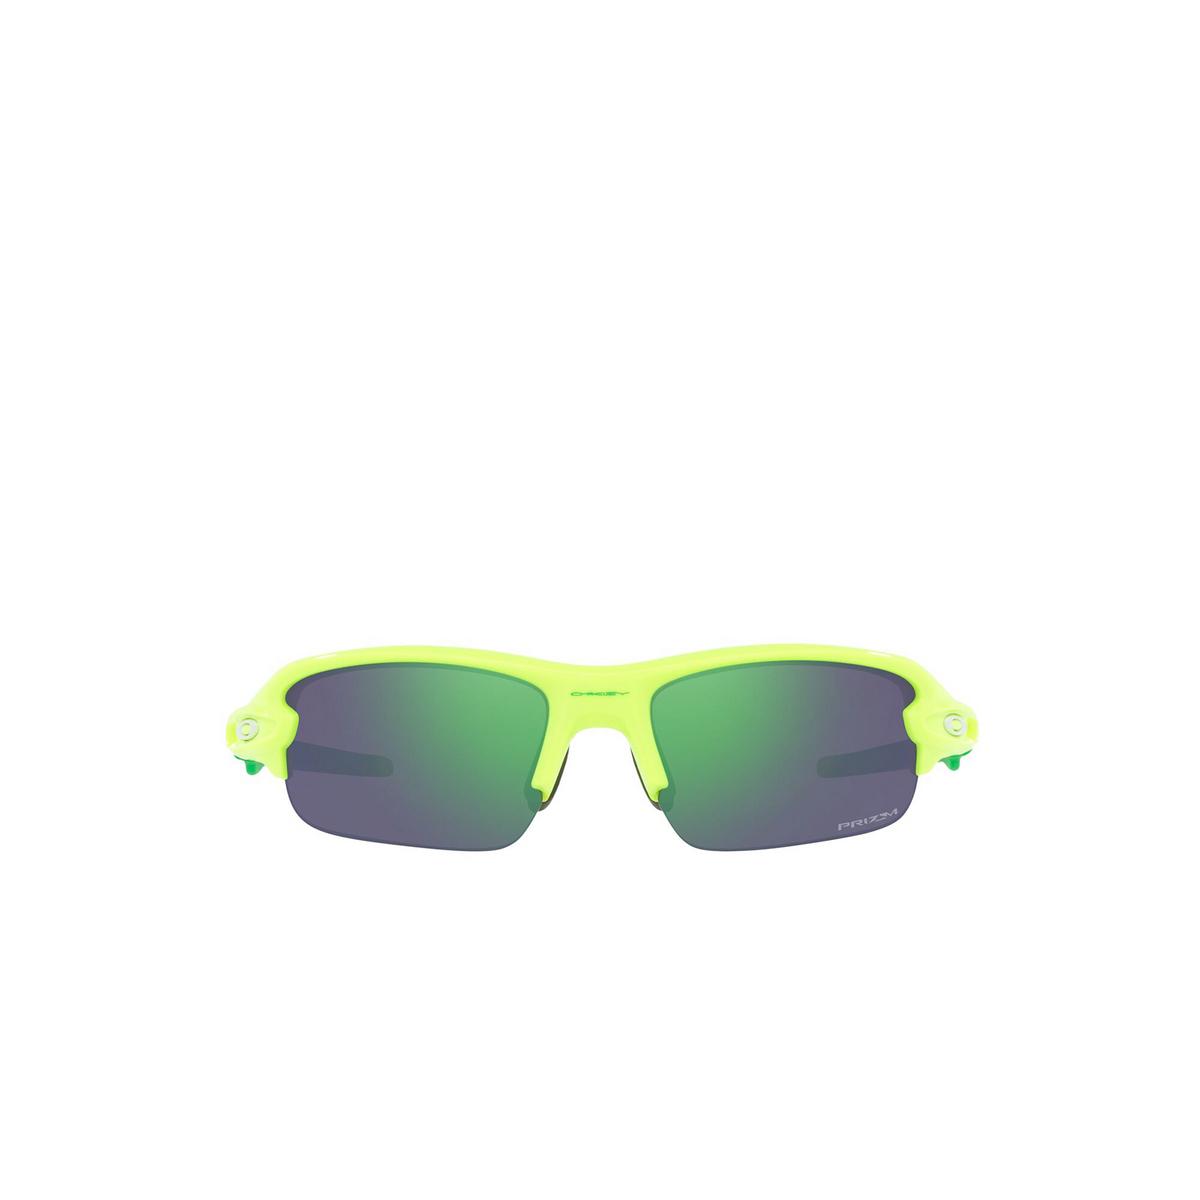 Oakley® Rectangle Sunglasses: Flak Xxs OJ9008 color Retina Burn 900804 - front view.